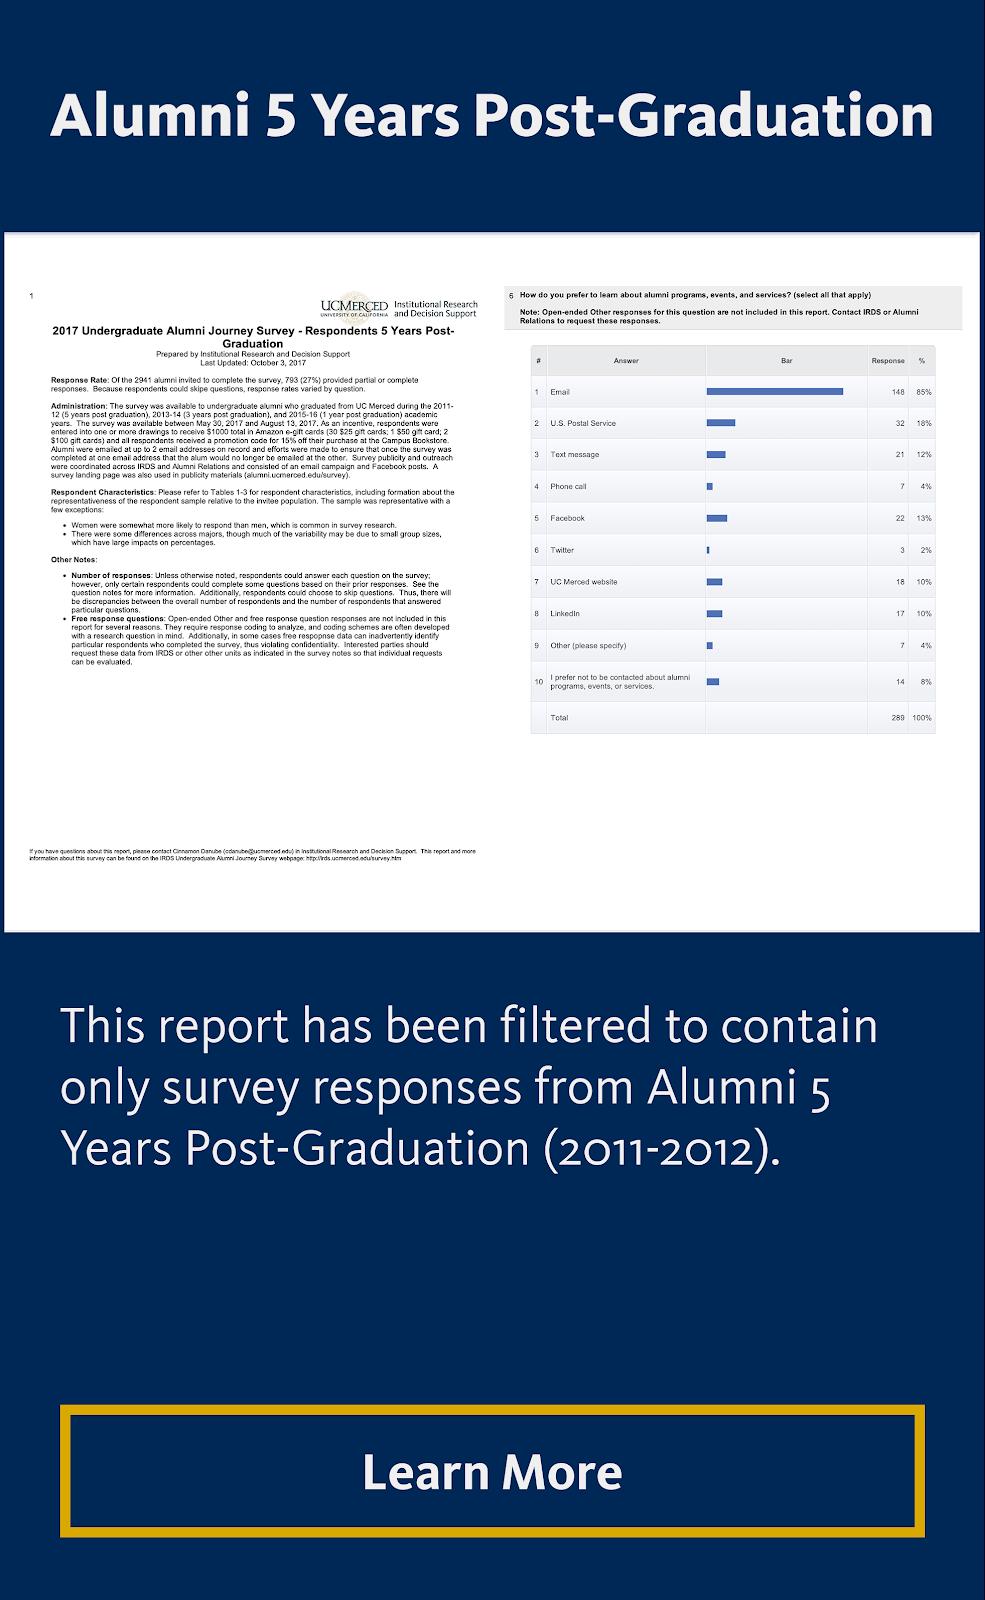 2017 Alumni 5 Years Post-Graduation